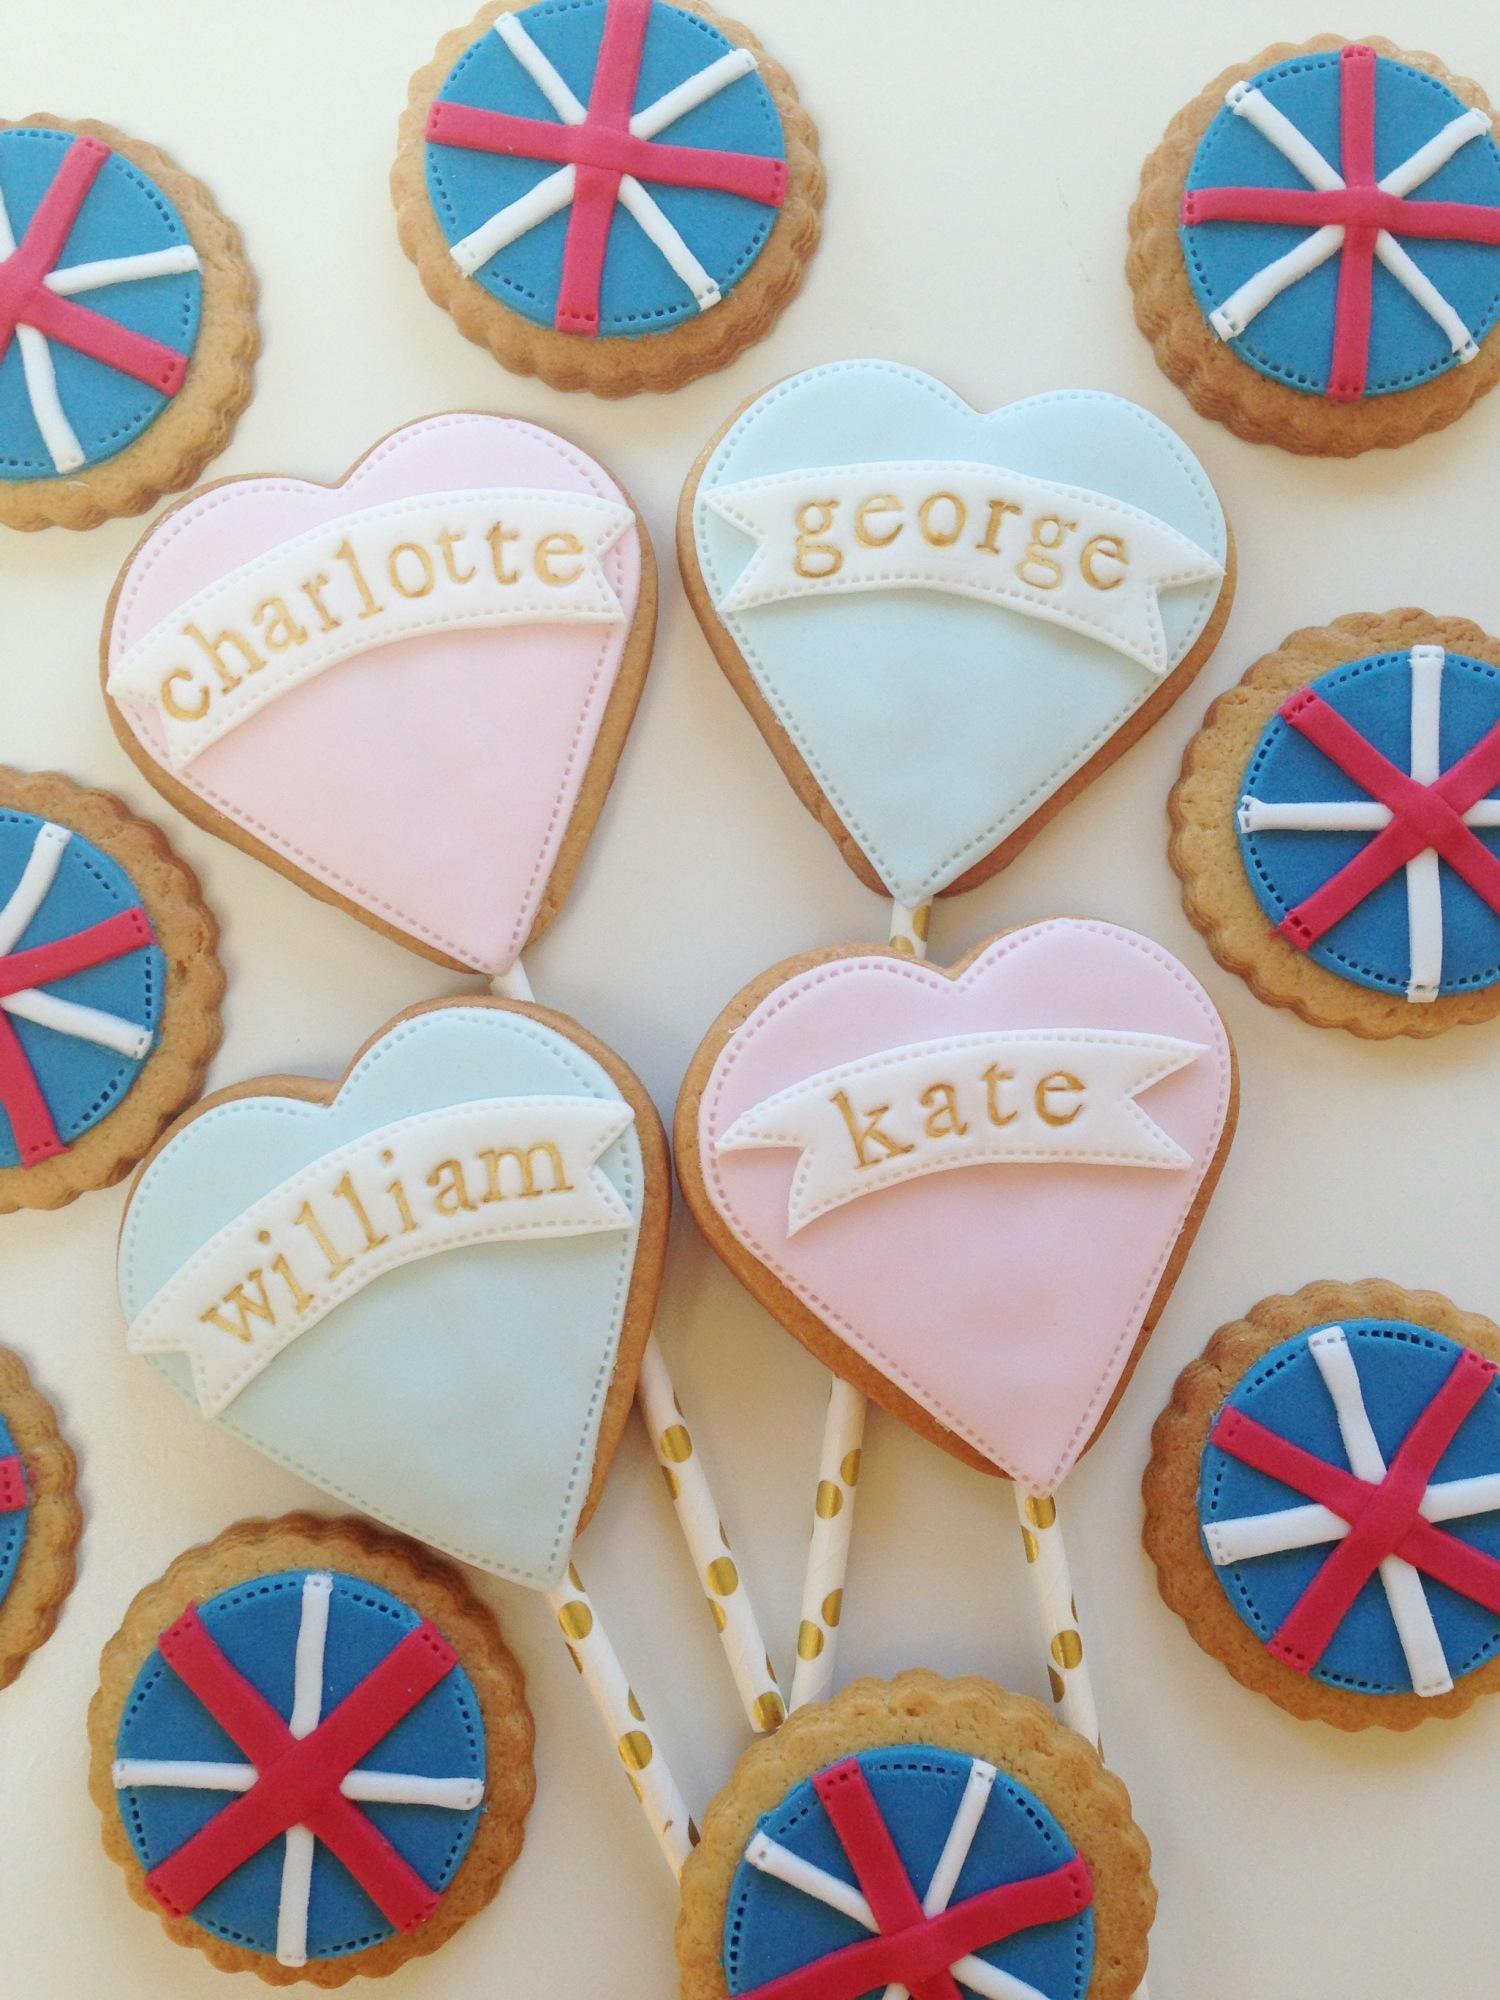 Nila Holden RoyalVisitLuton biscuits